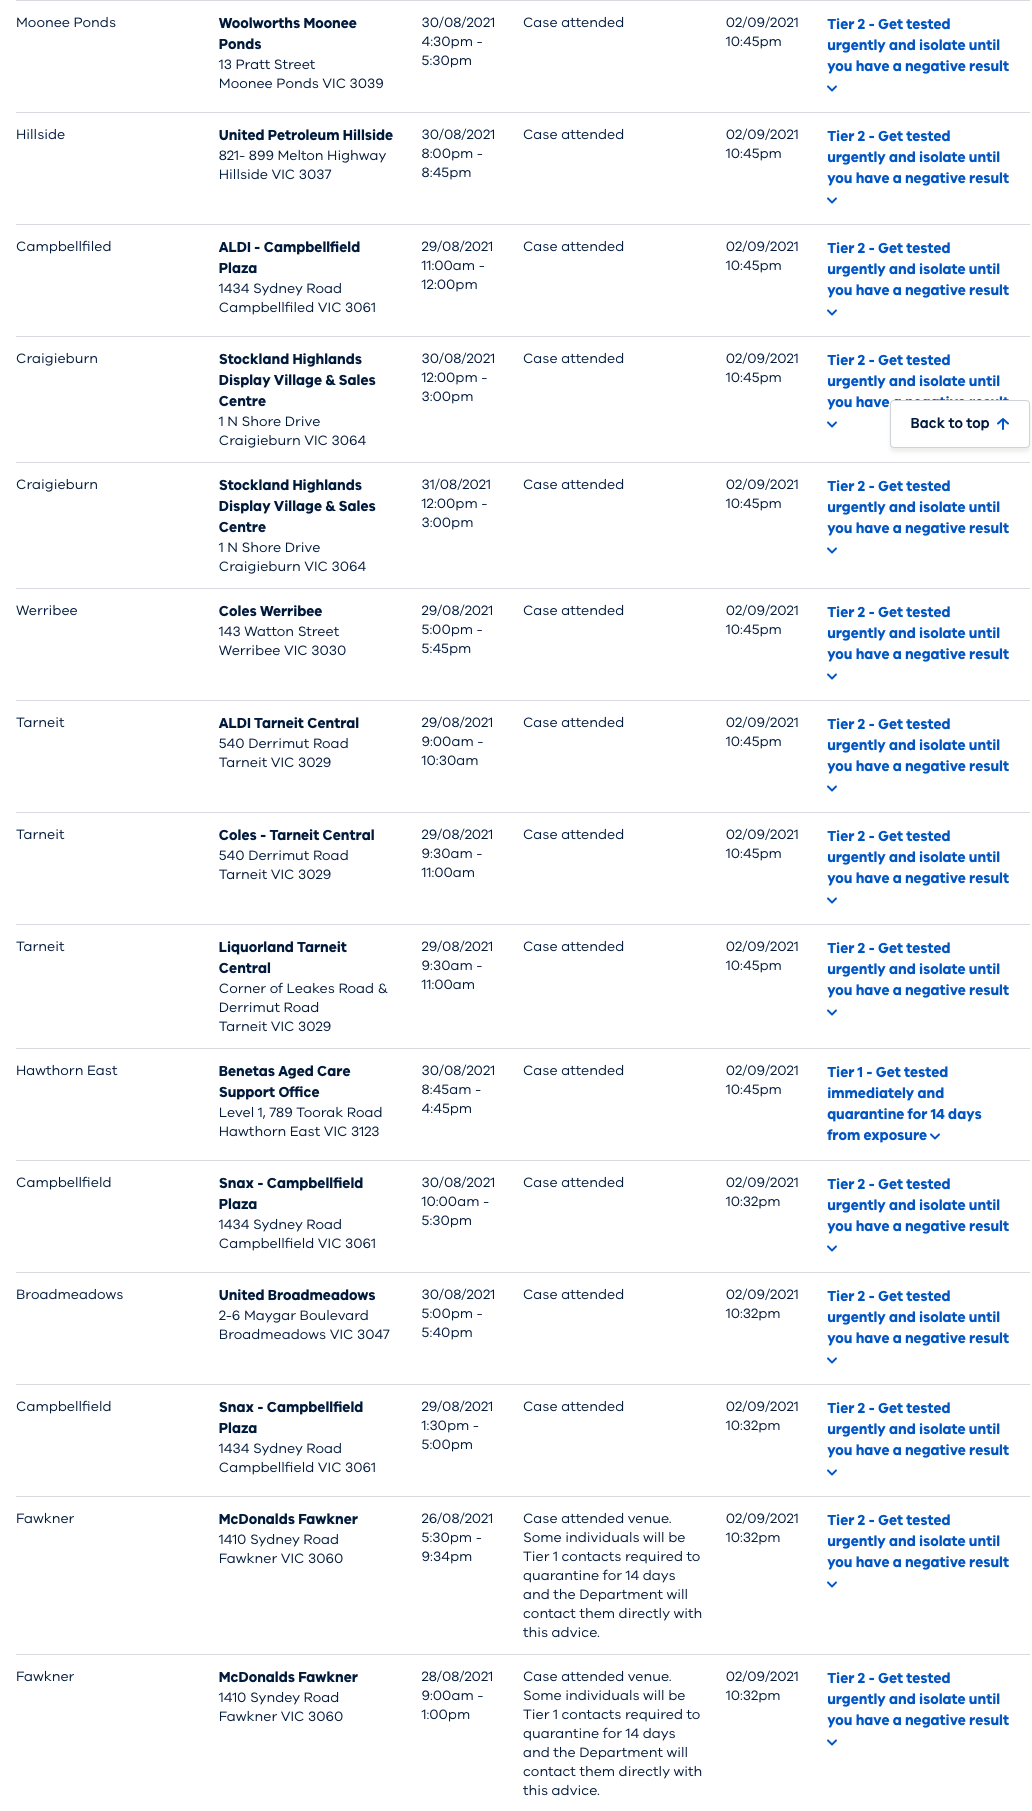 www.coronavirus.vic.gov.au_exposure-sites (35)的副本.png